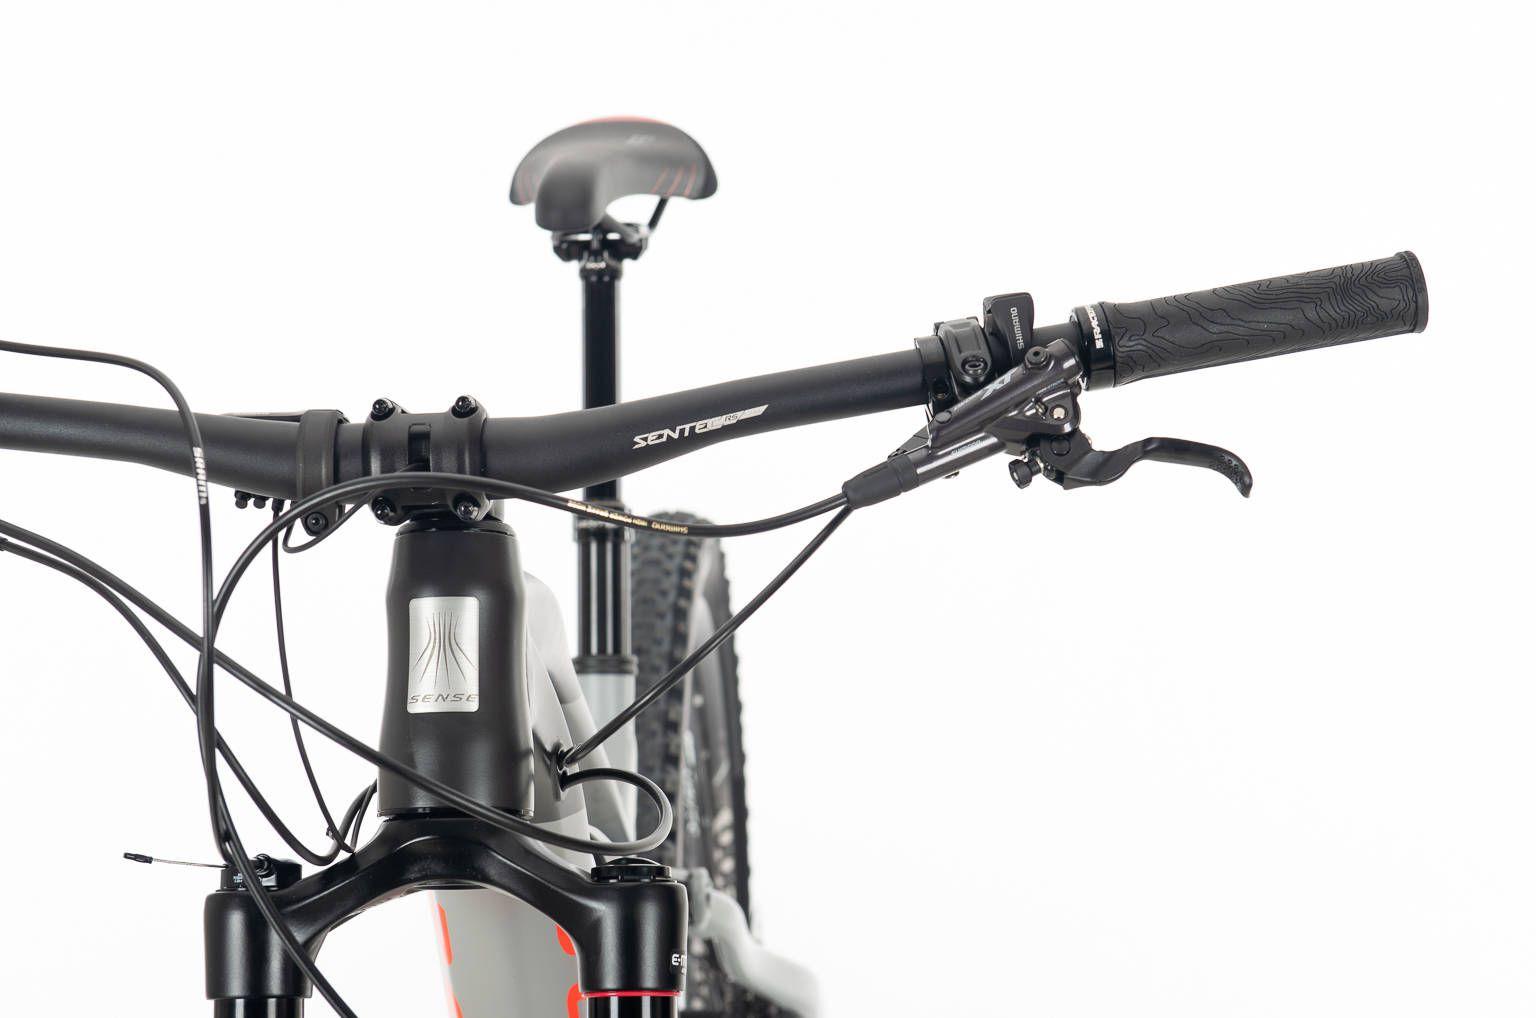 Bicicleta SENSE Impulse E-Trail 2020 - 12v Shimano XT - Vermelho Neon/Chumbo